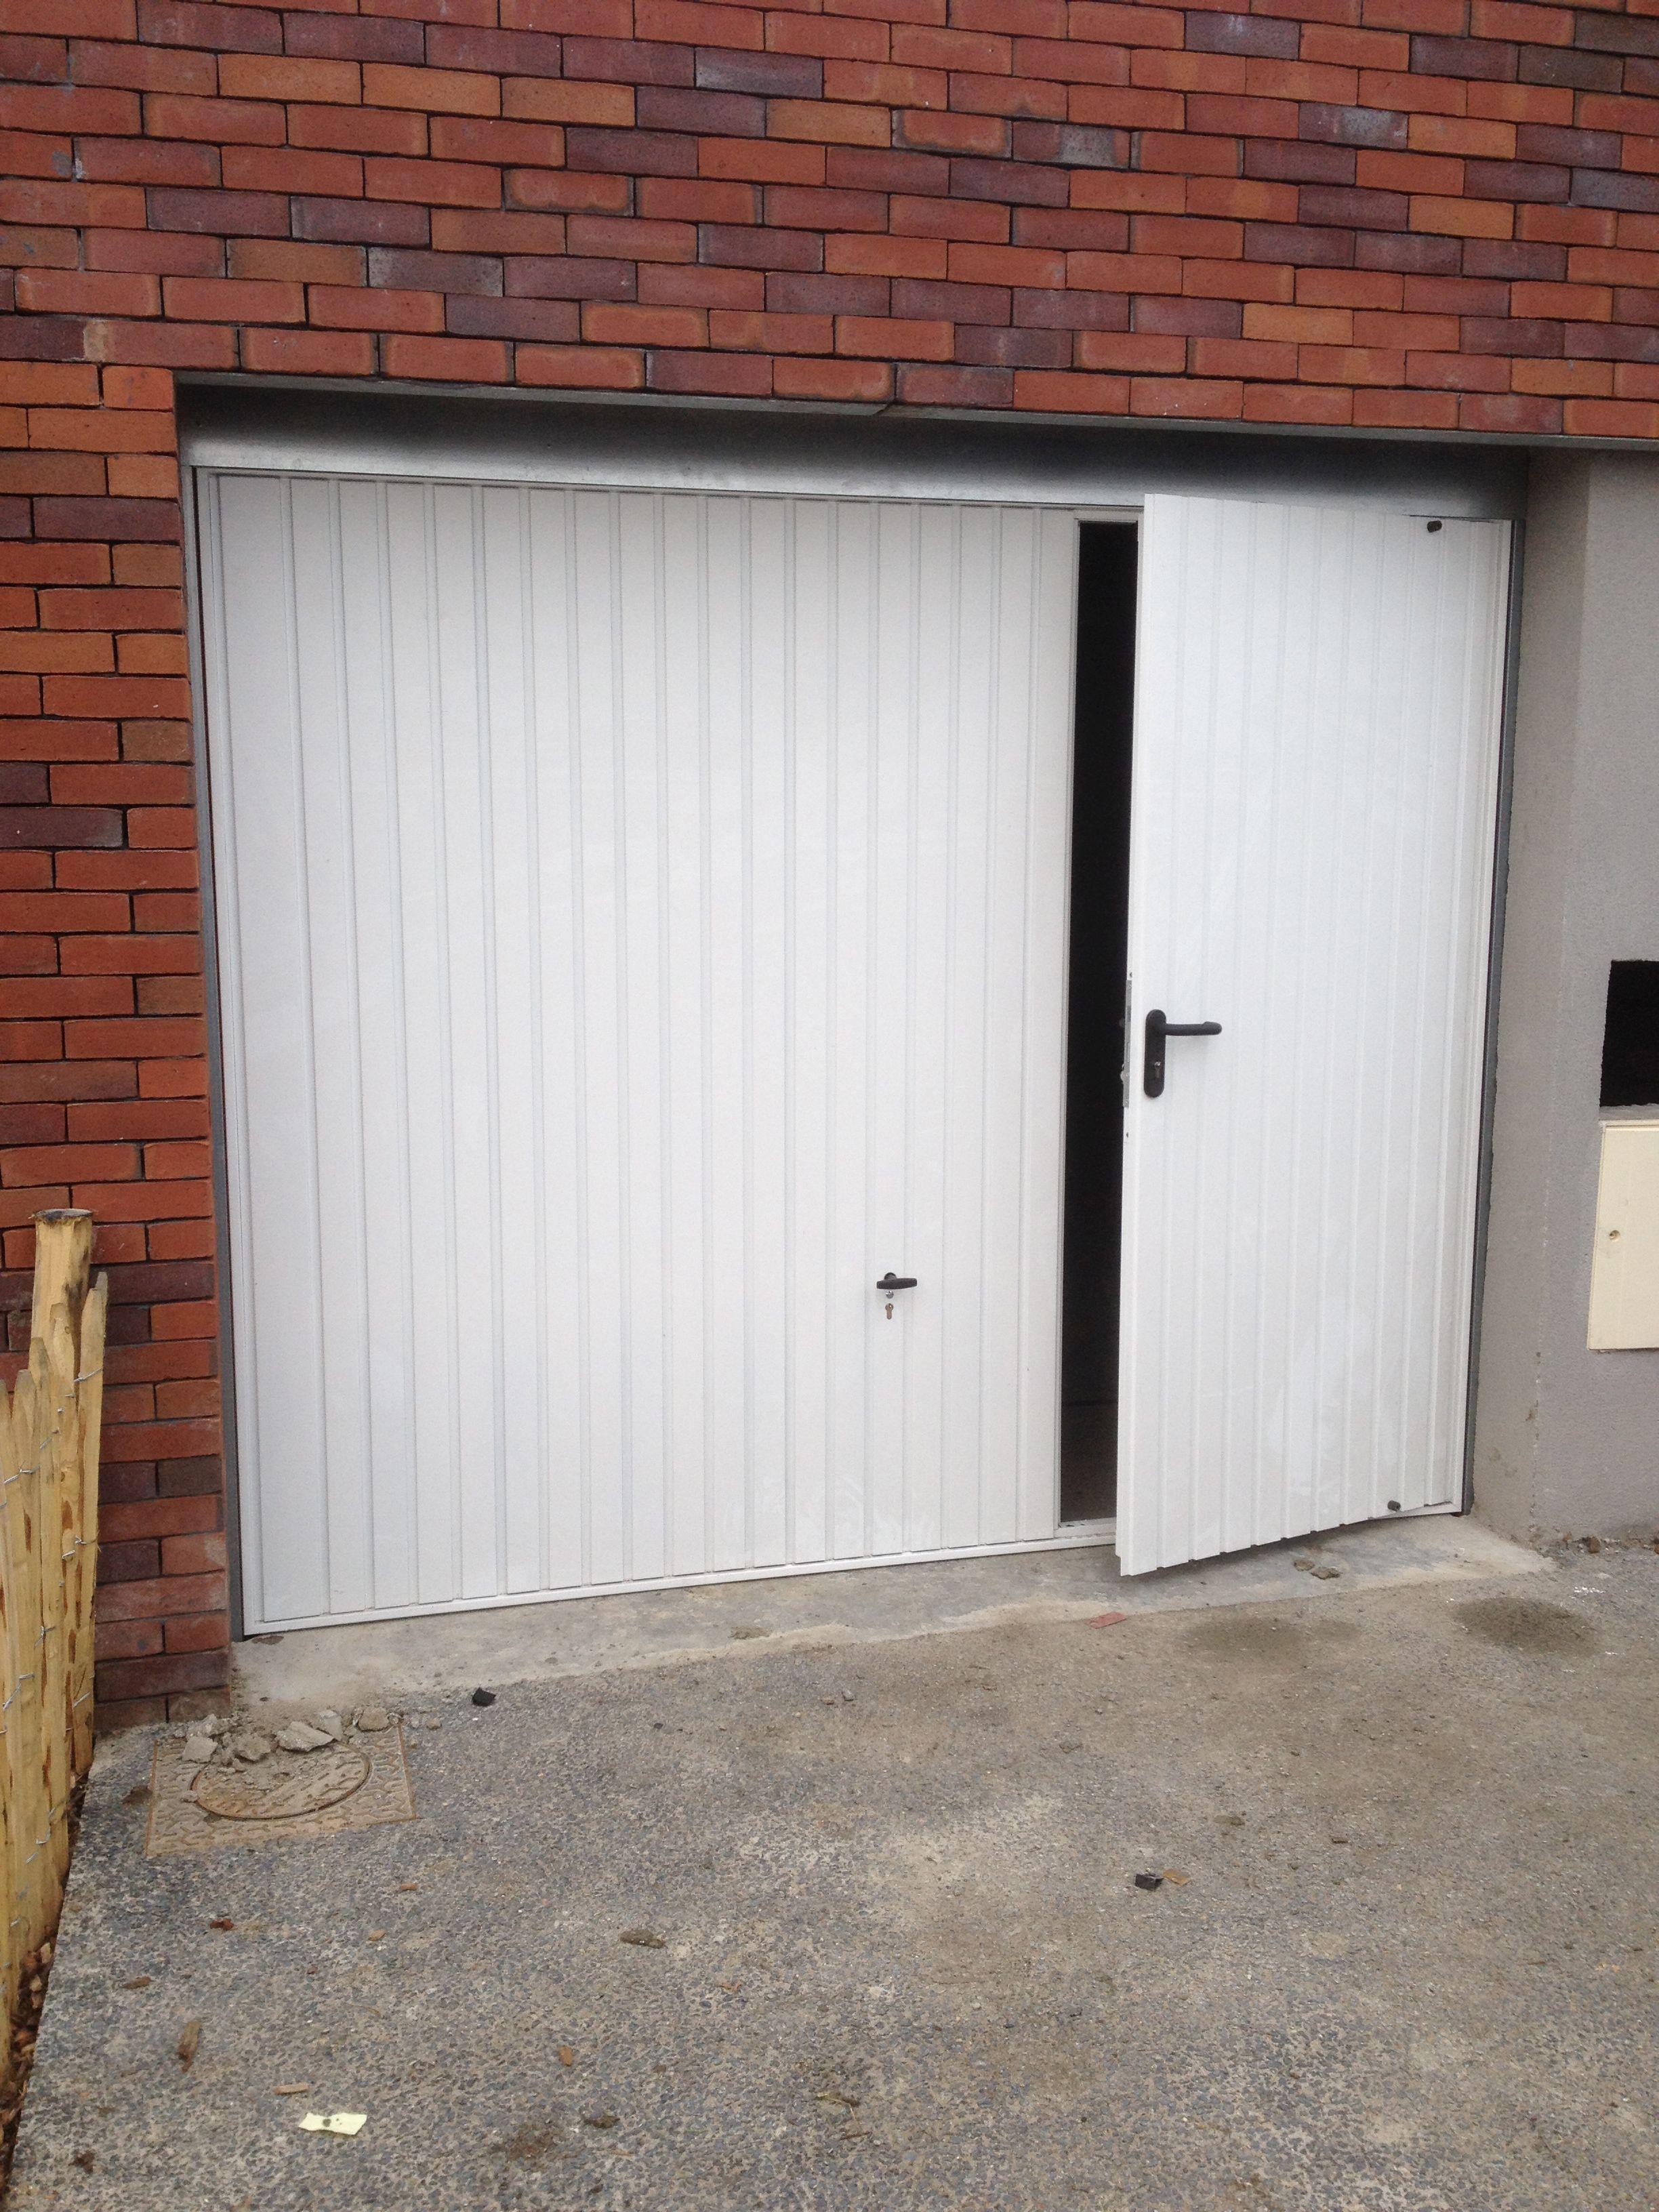 Novoferm noviso novorol novoside dhaze portes de garage - Porte garage basculante avec portillon ...